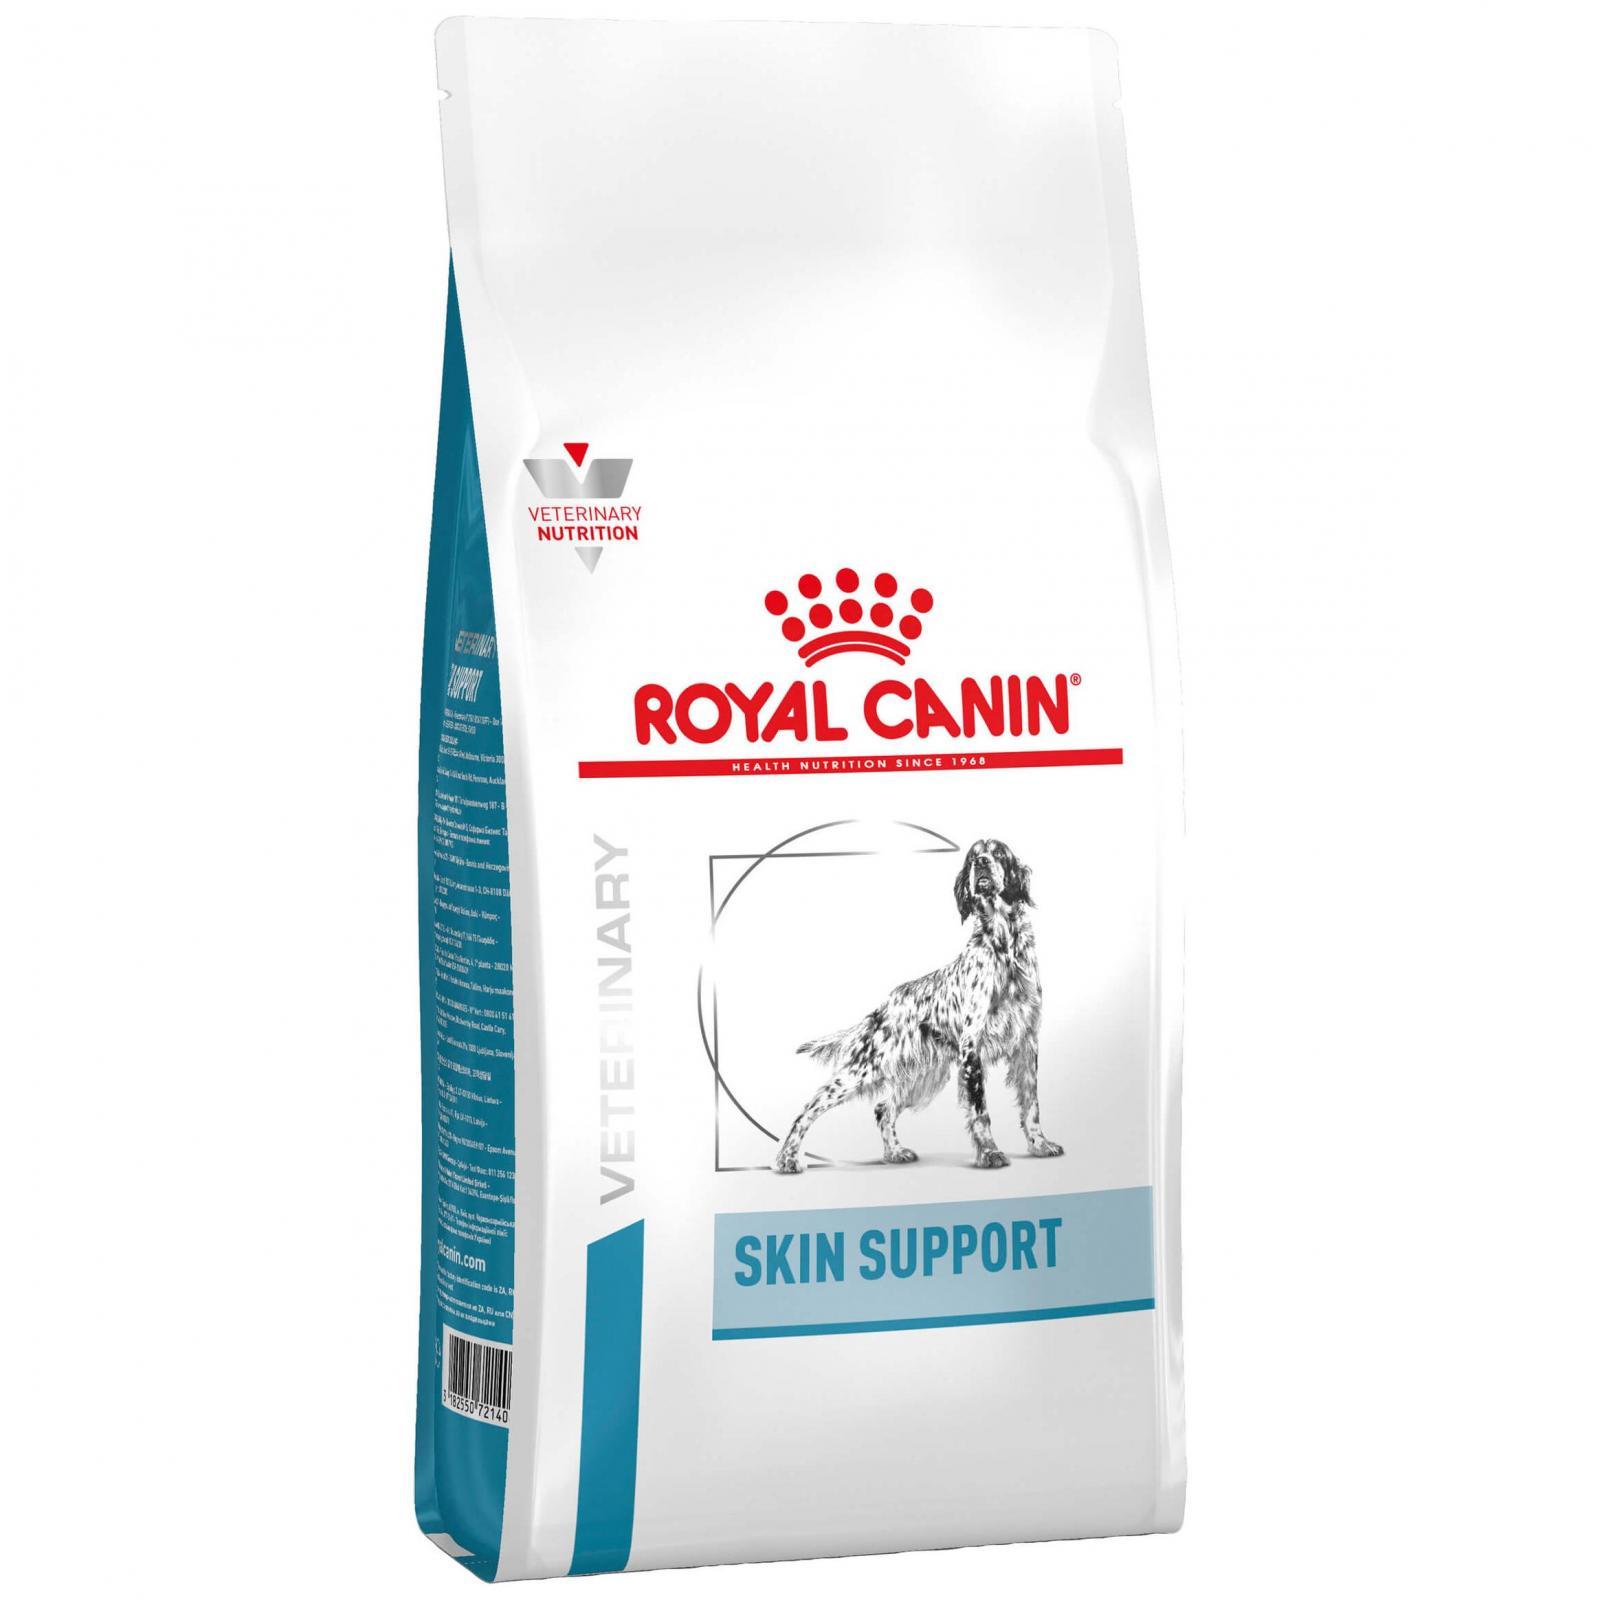 Prescription Dog Food >> Royal Canin Canine Dry Skin Support